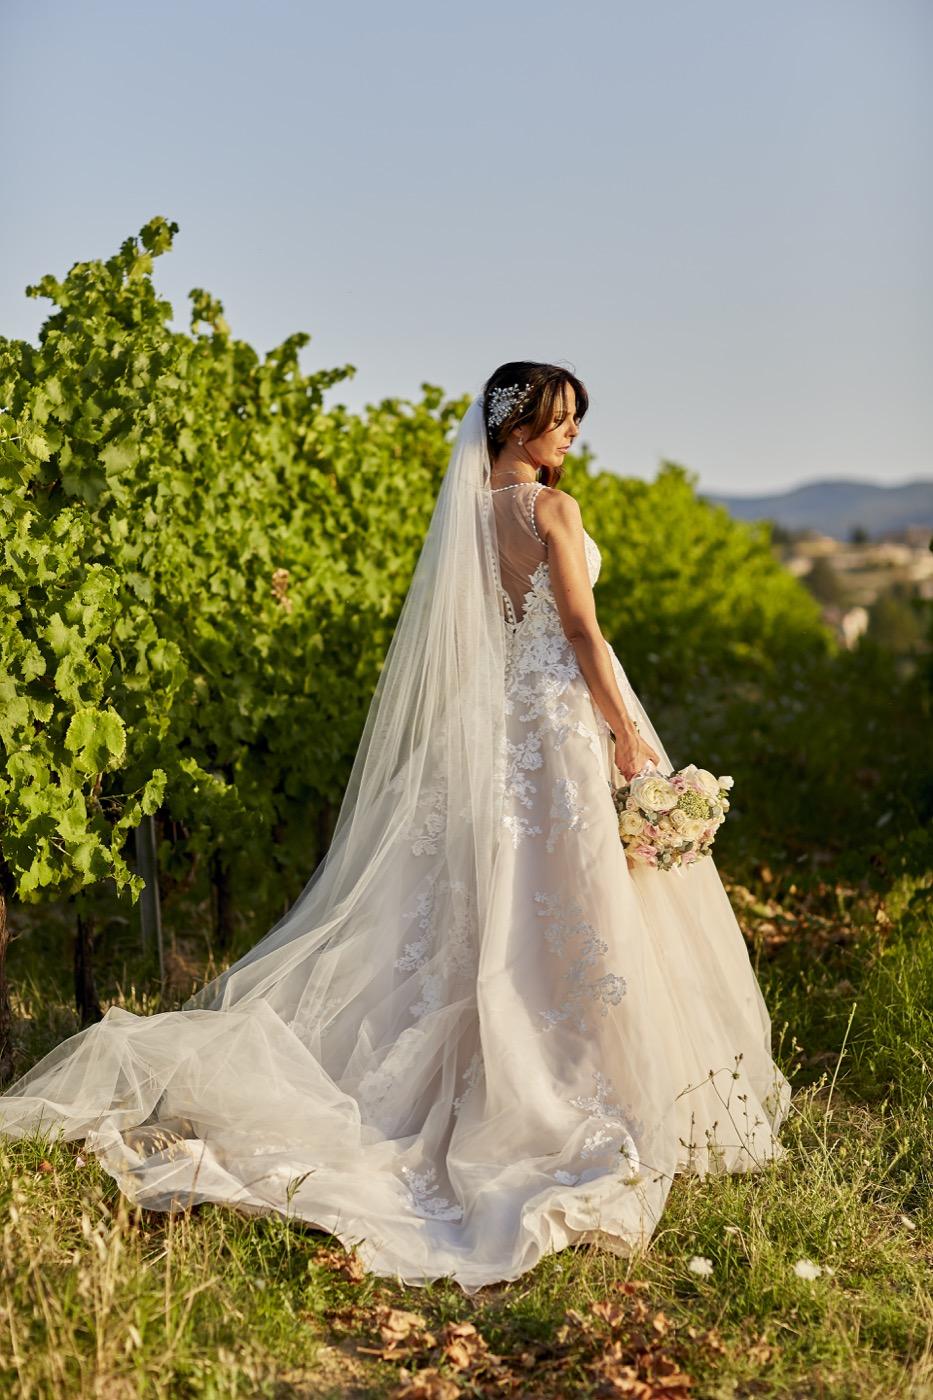 Claudio-Coppola-wedding-photographer-la-scuderia-eventi-preparativi-la-rosetta-perugia-68